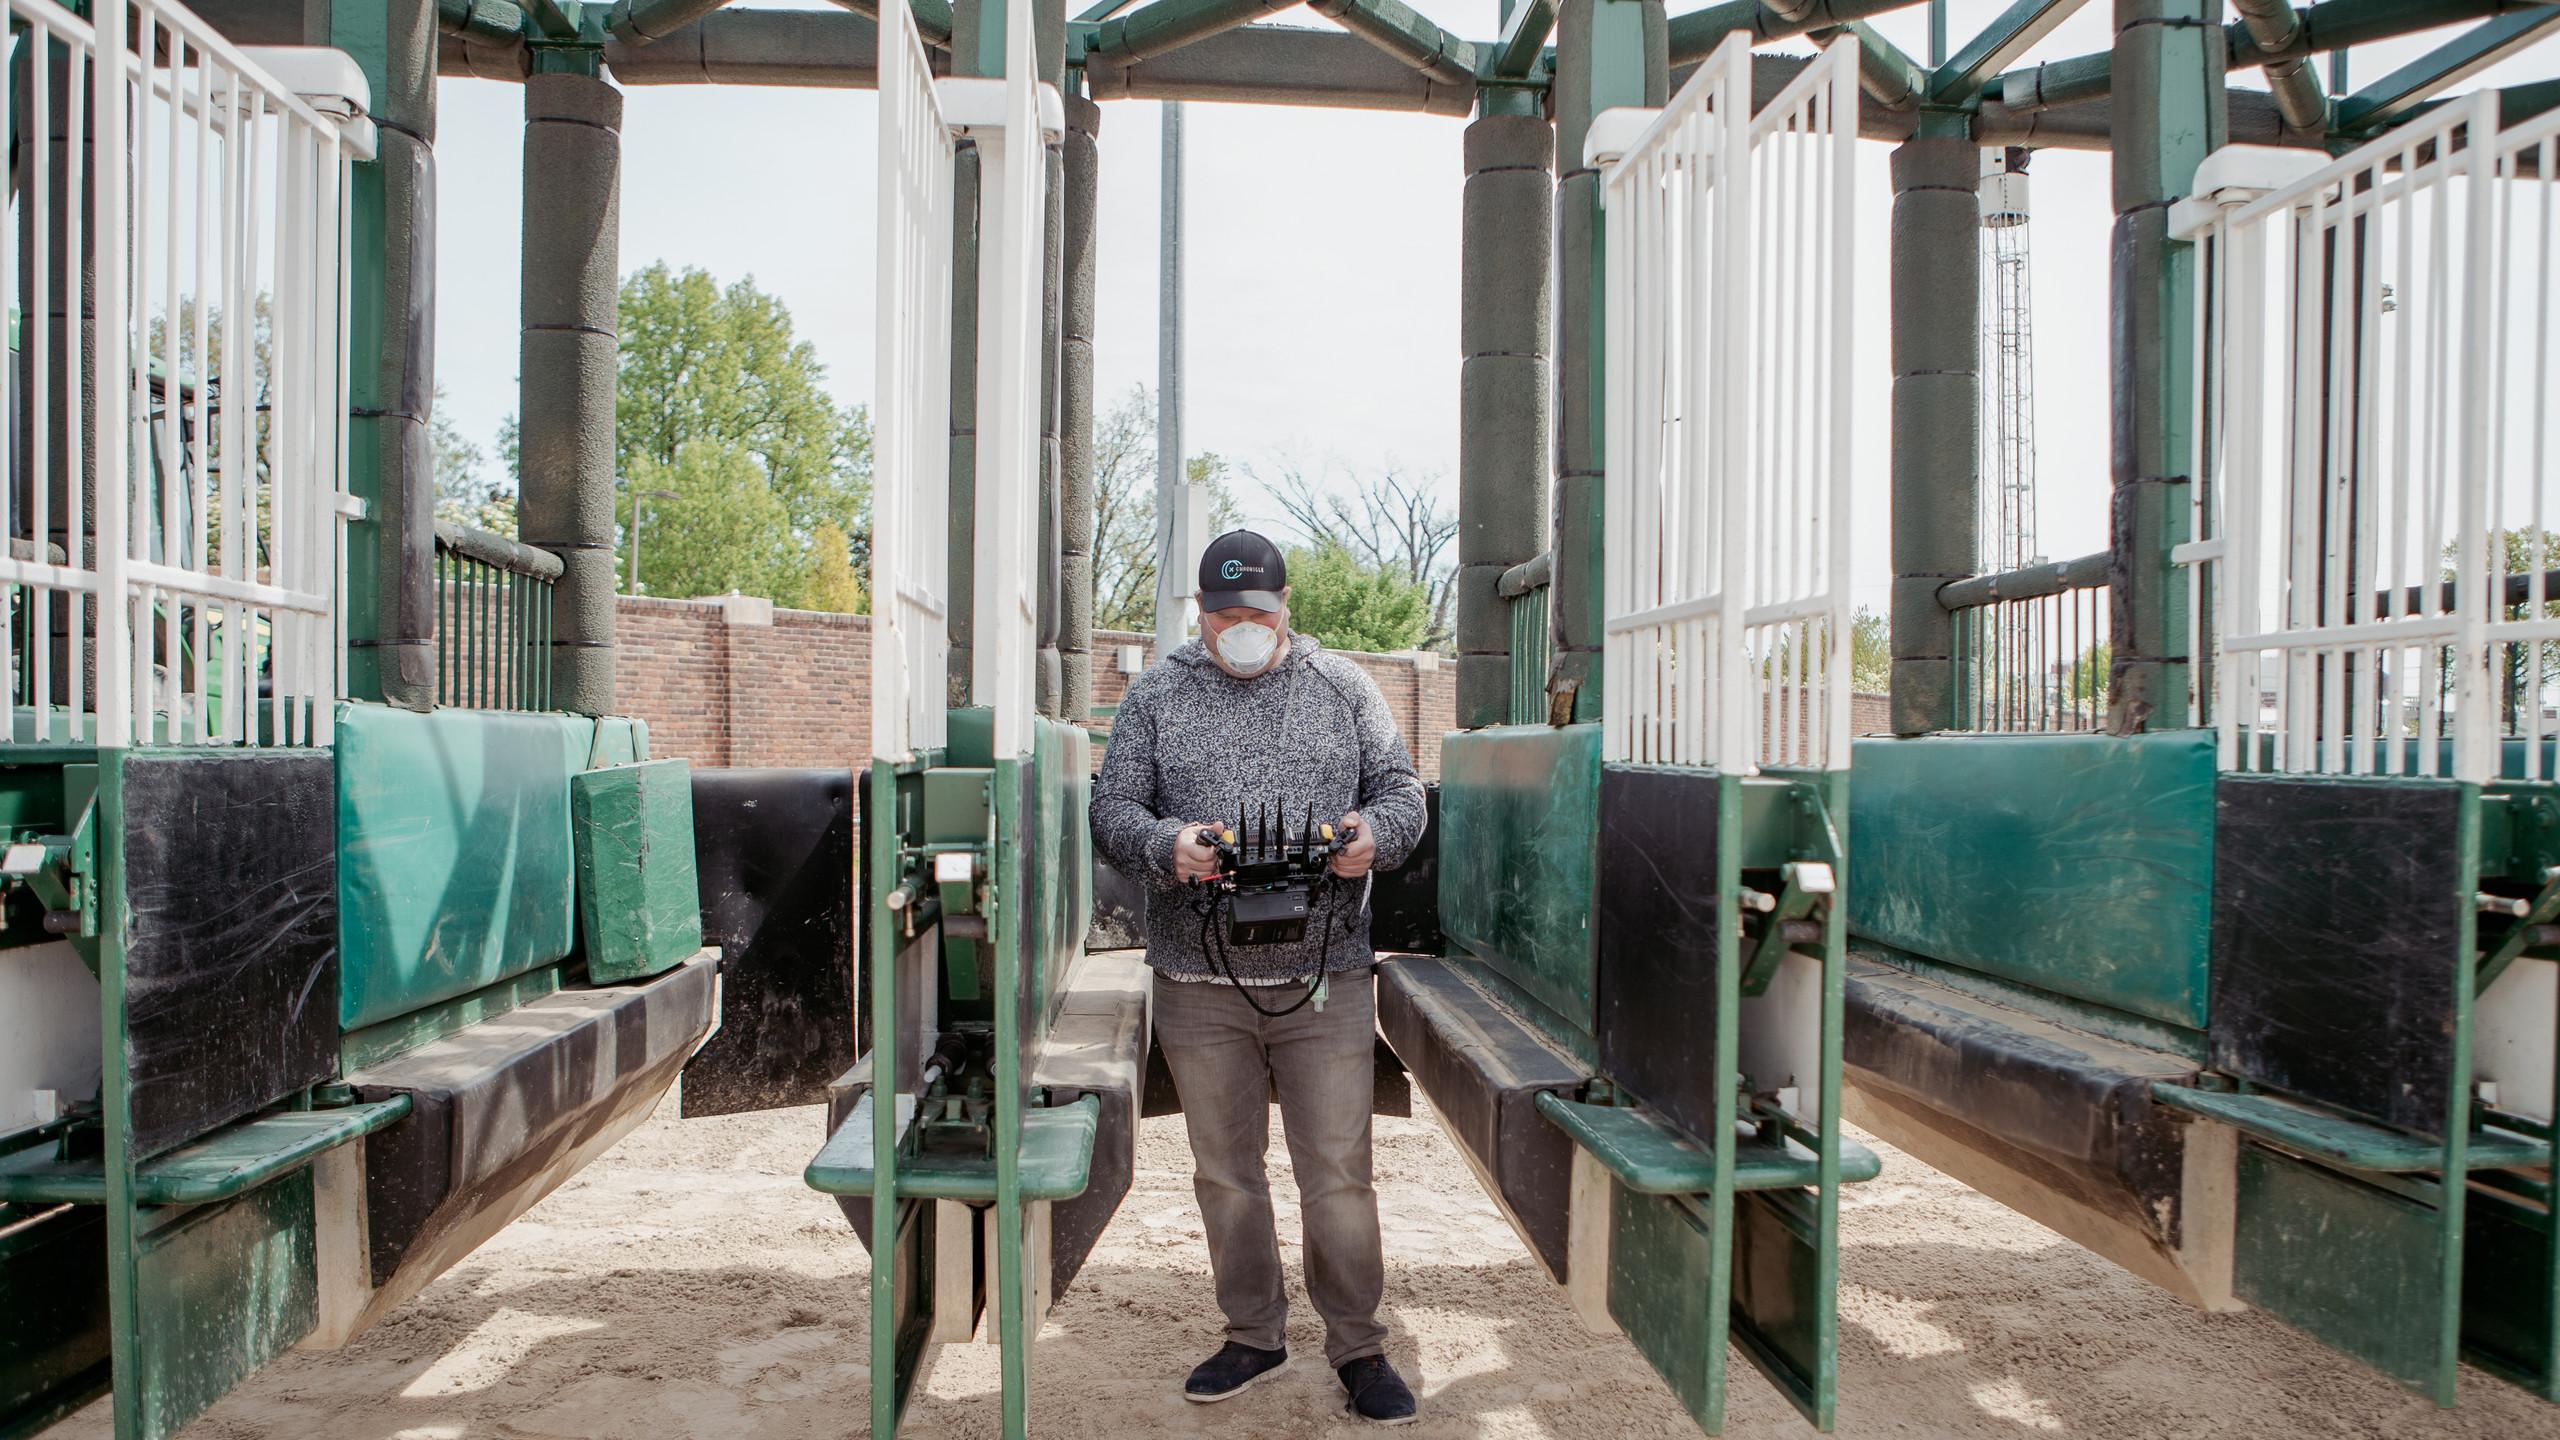 Director Zach Meiners in the gate